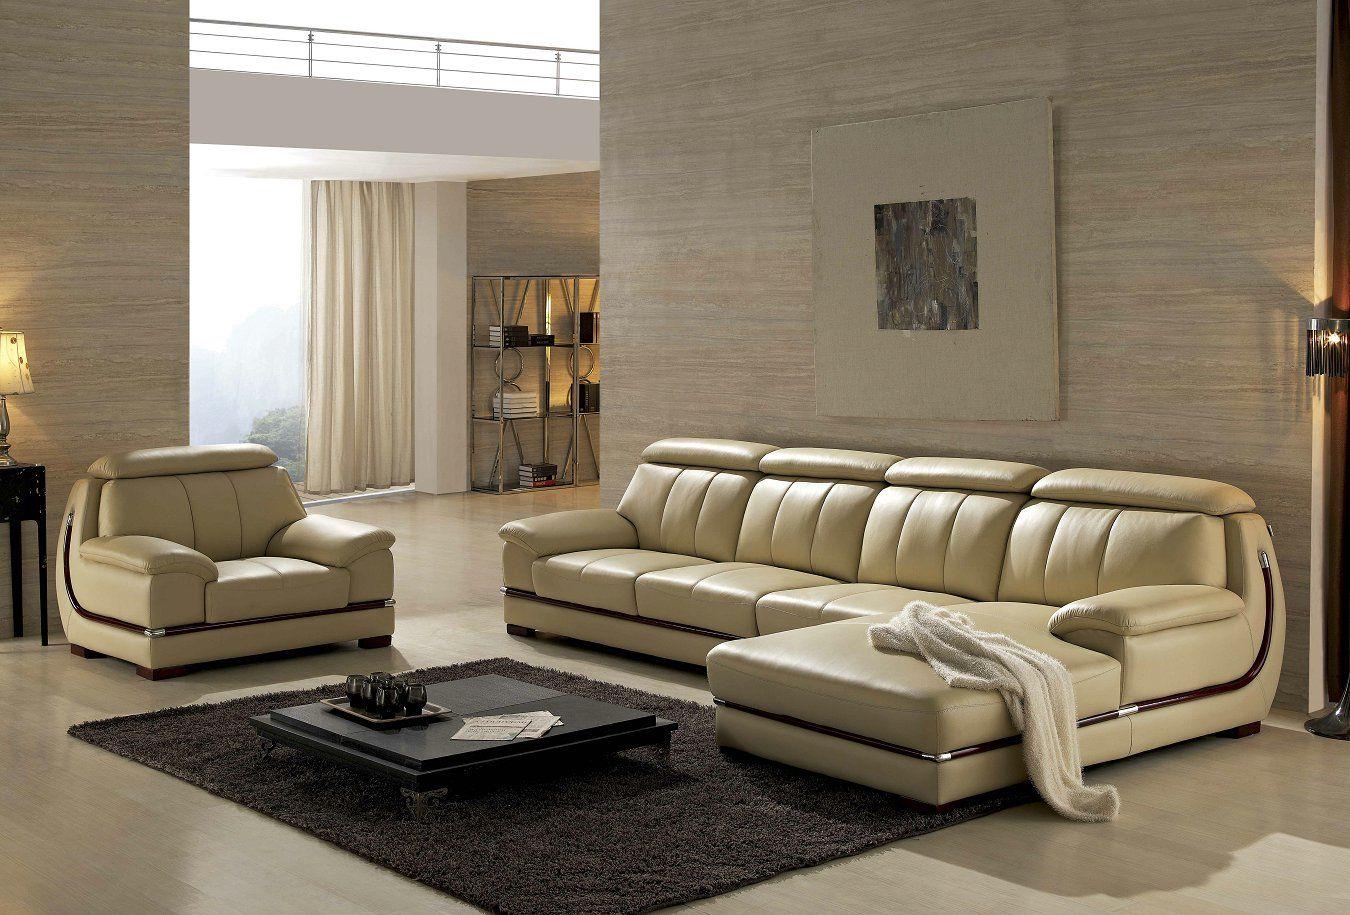 Pin By Molan On Modern Leather Sofa Corner Sofa Living Room Living Room Sets Furniture Leather Corner Sofa